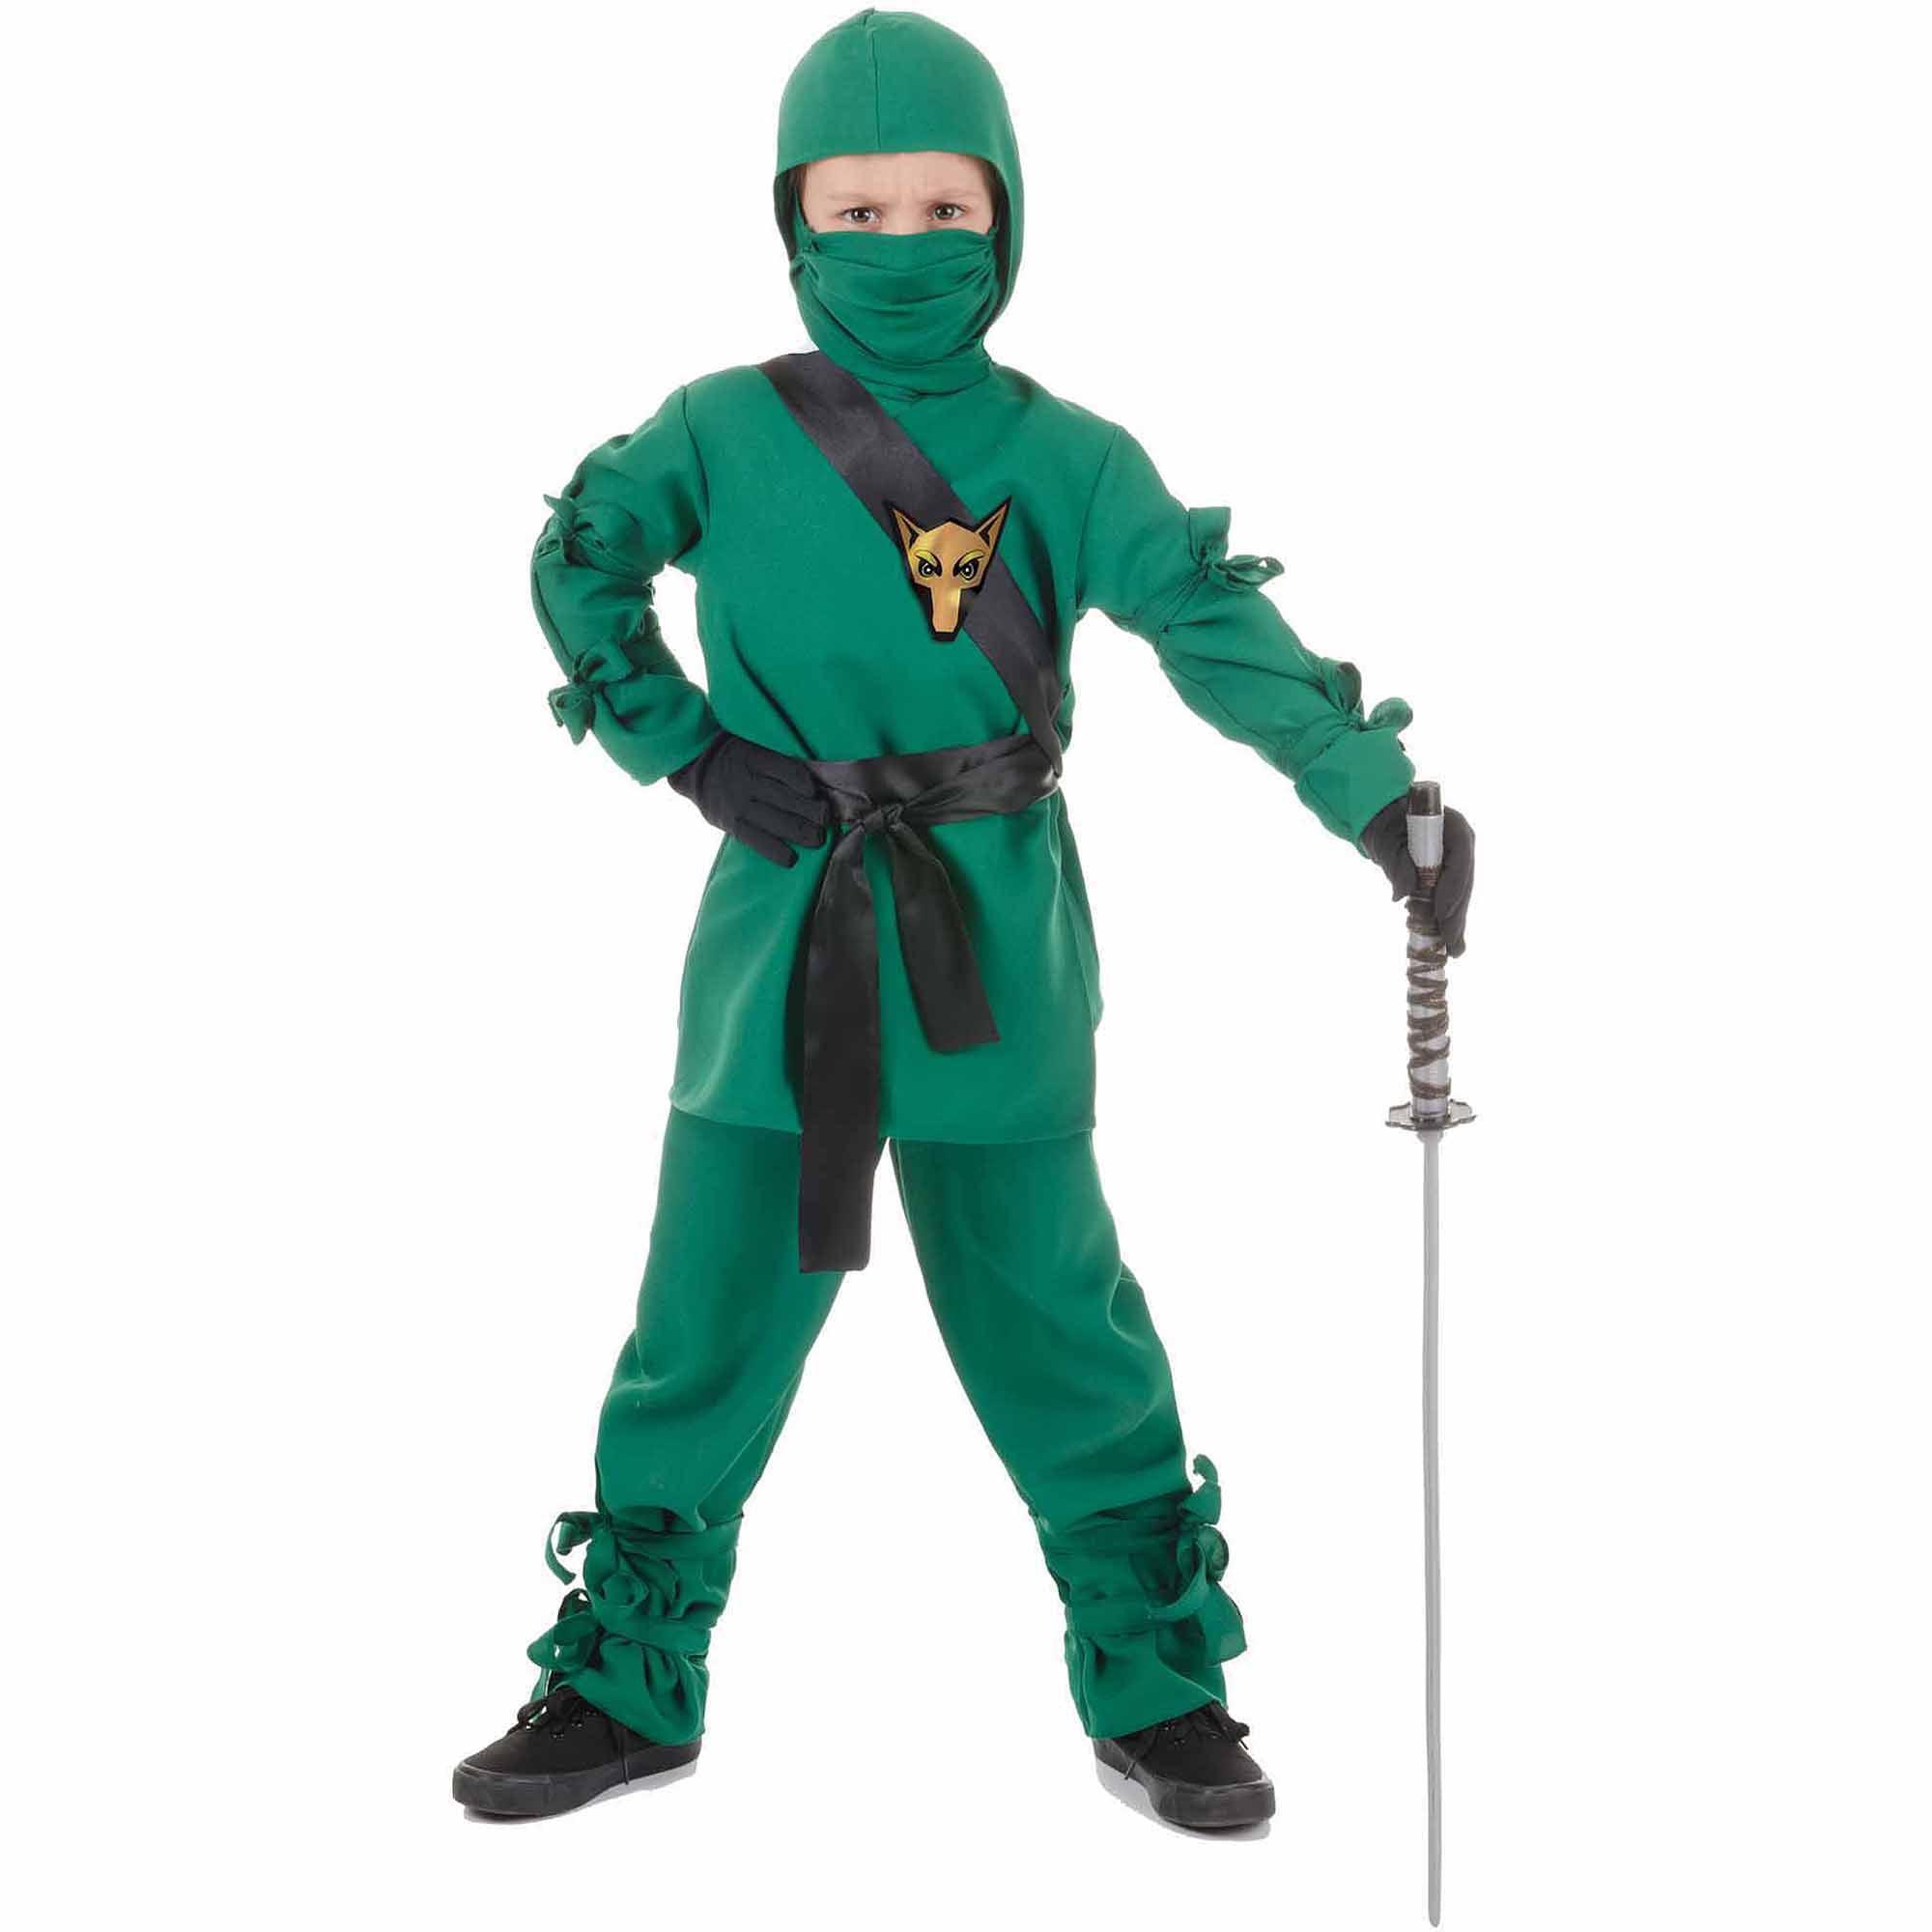 Green Ninja Child Halloween Costume - Walmart.com